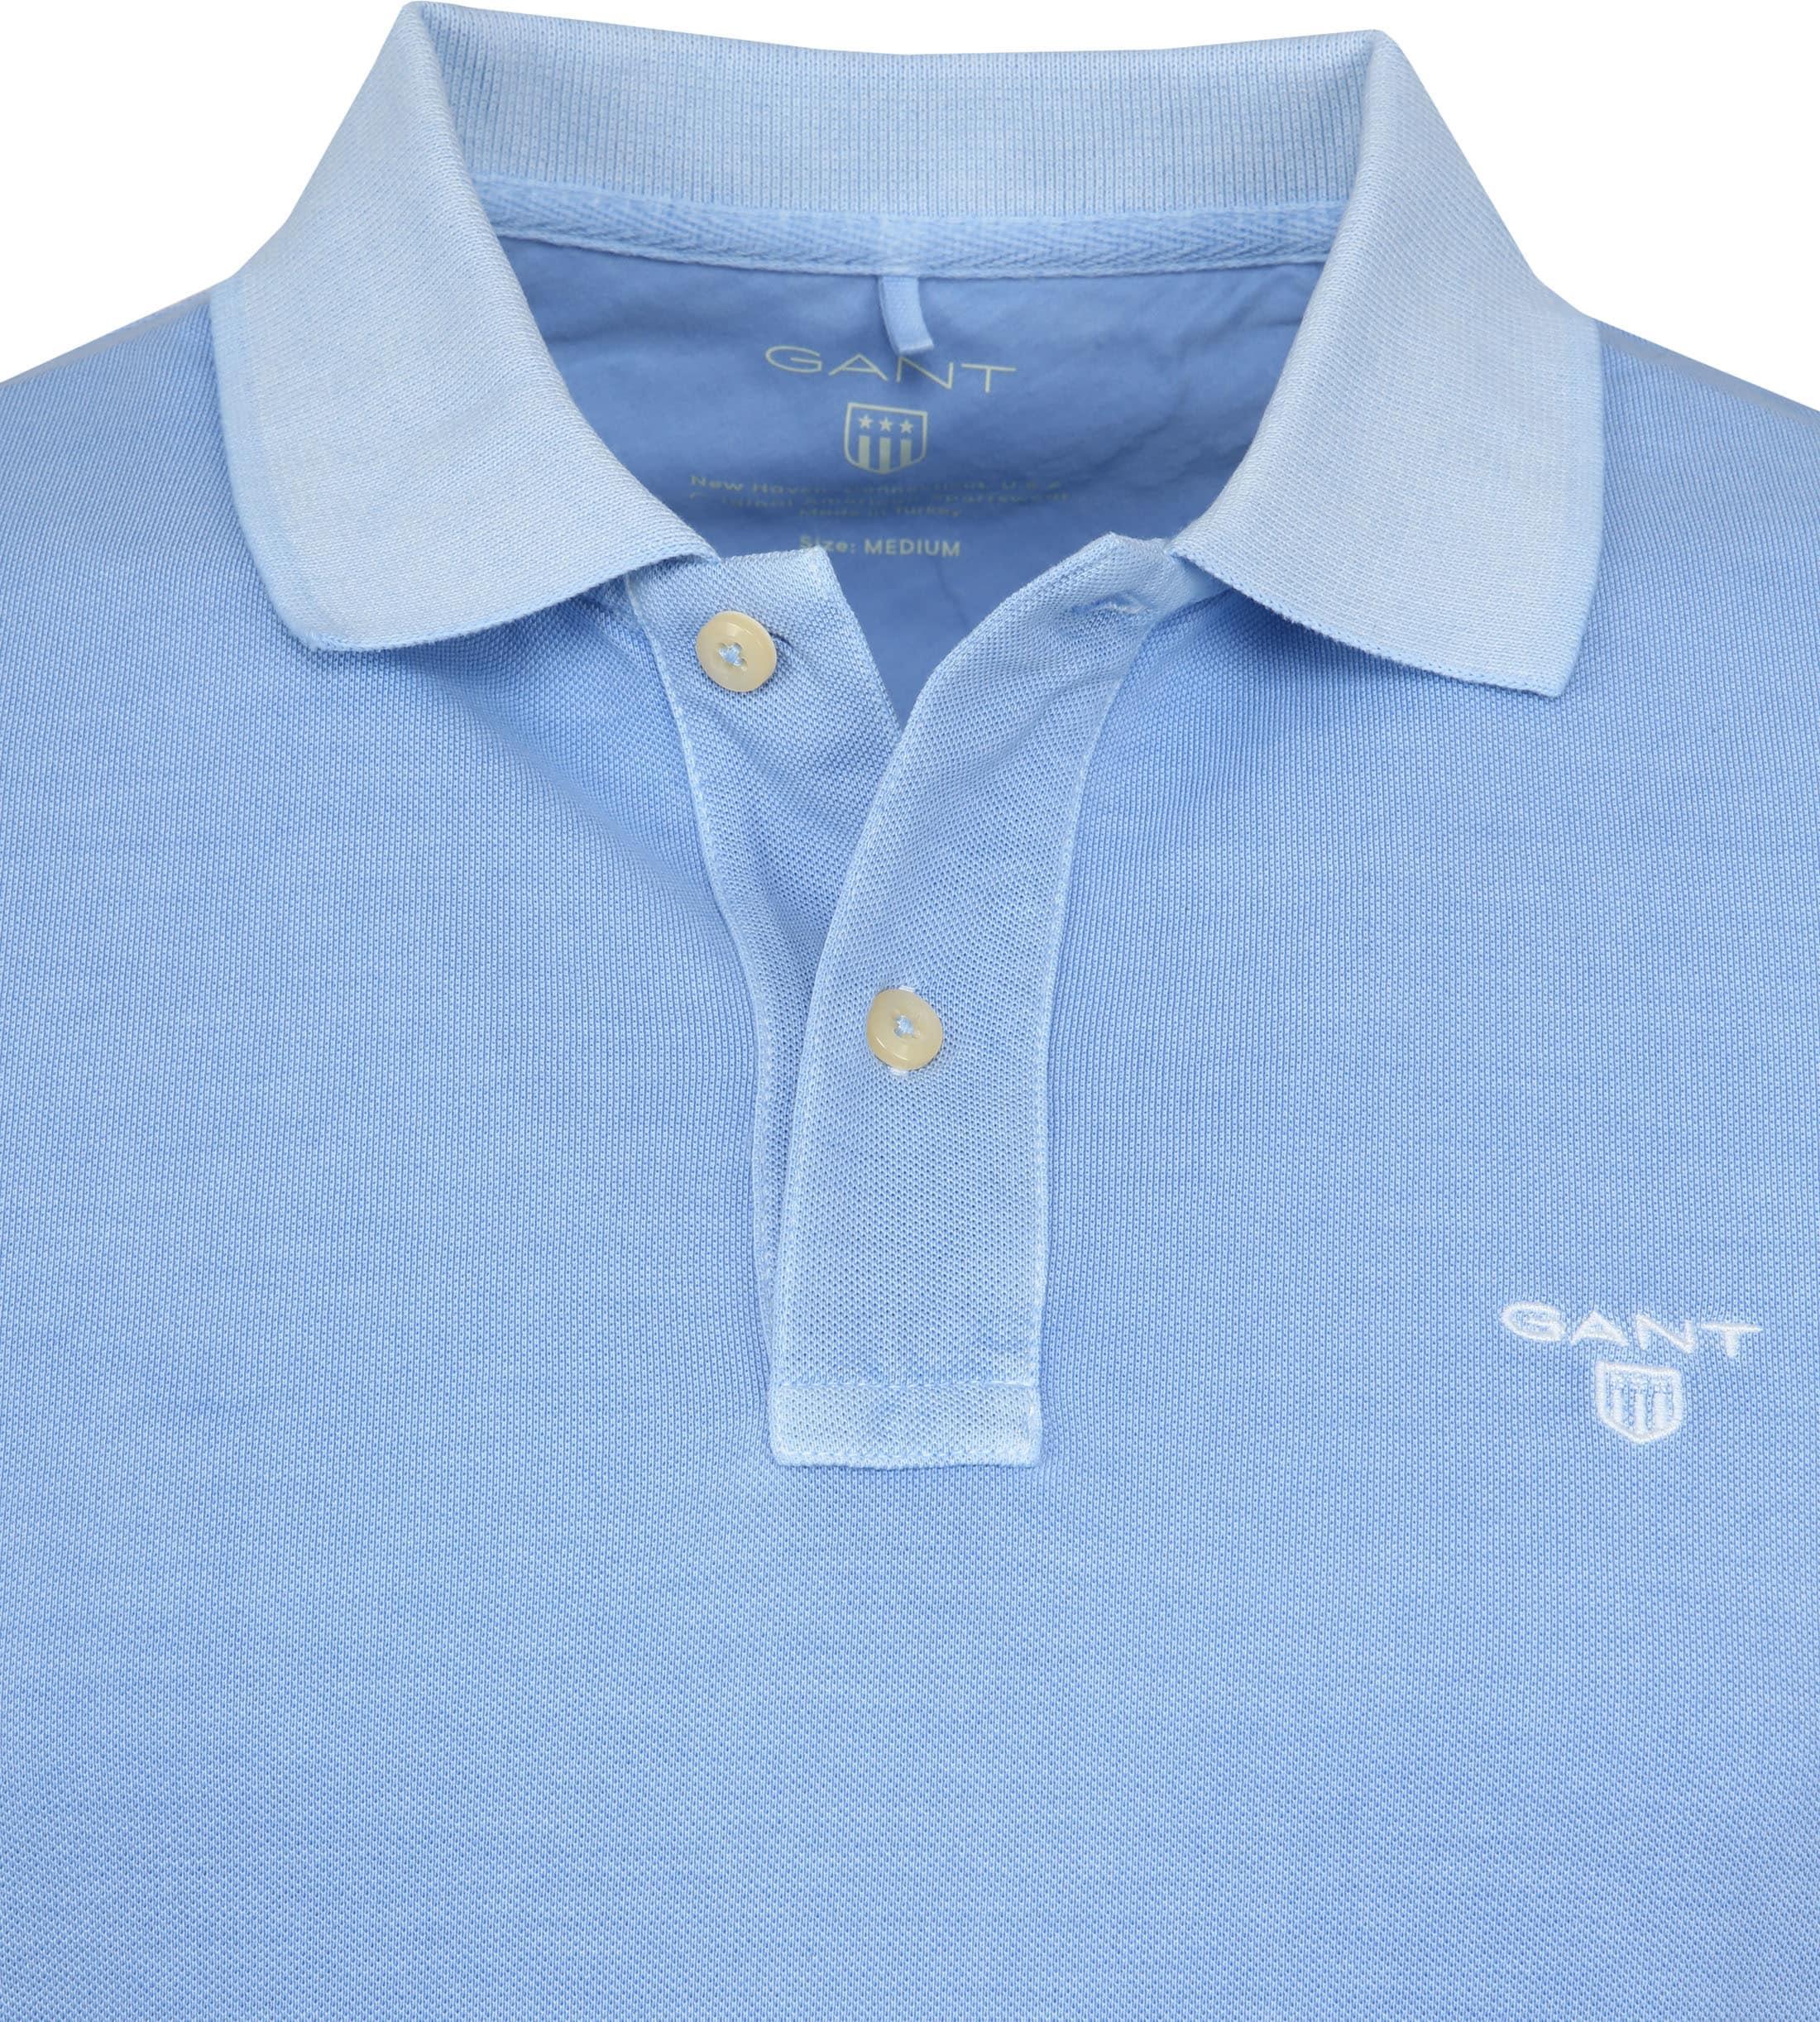 Gant Poloshirt Sunbleached Hellblau foto 1